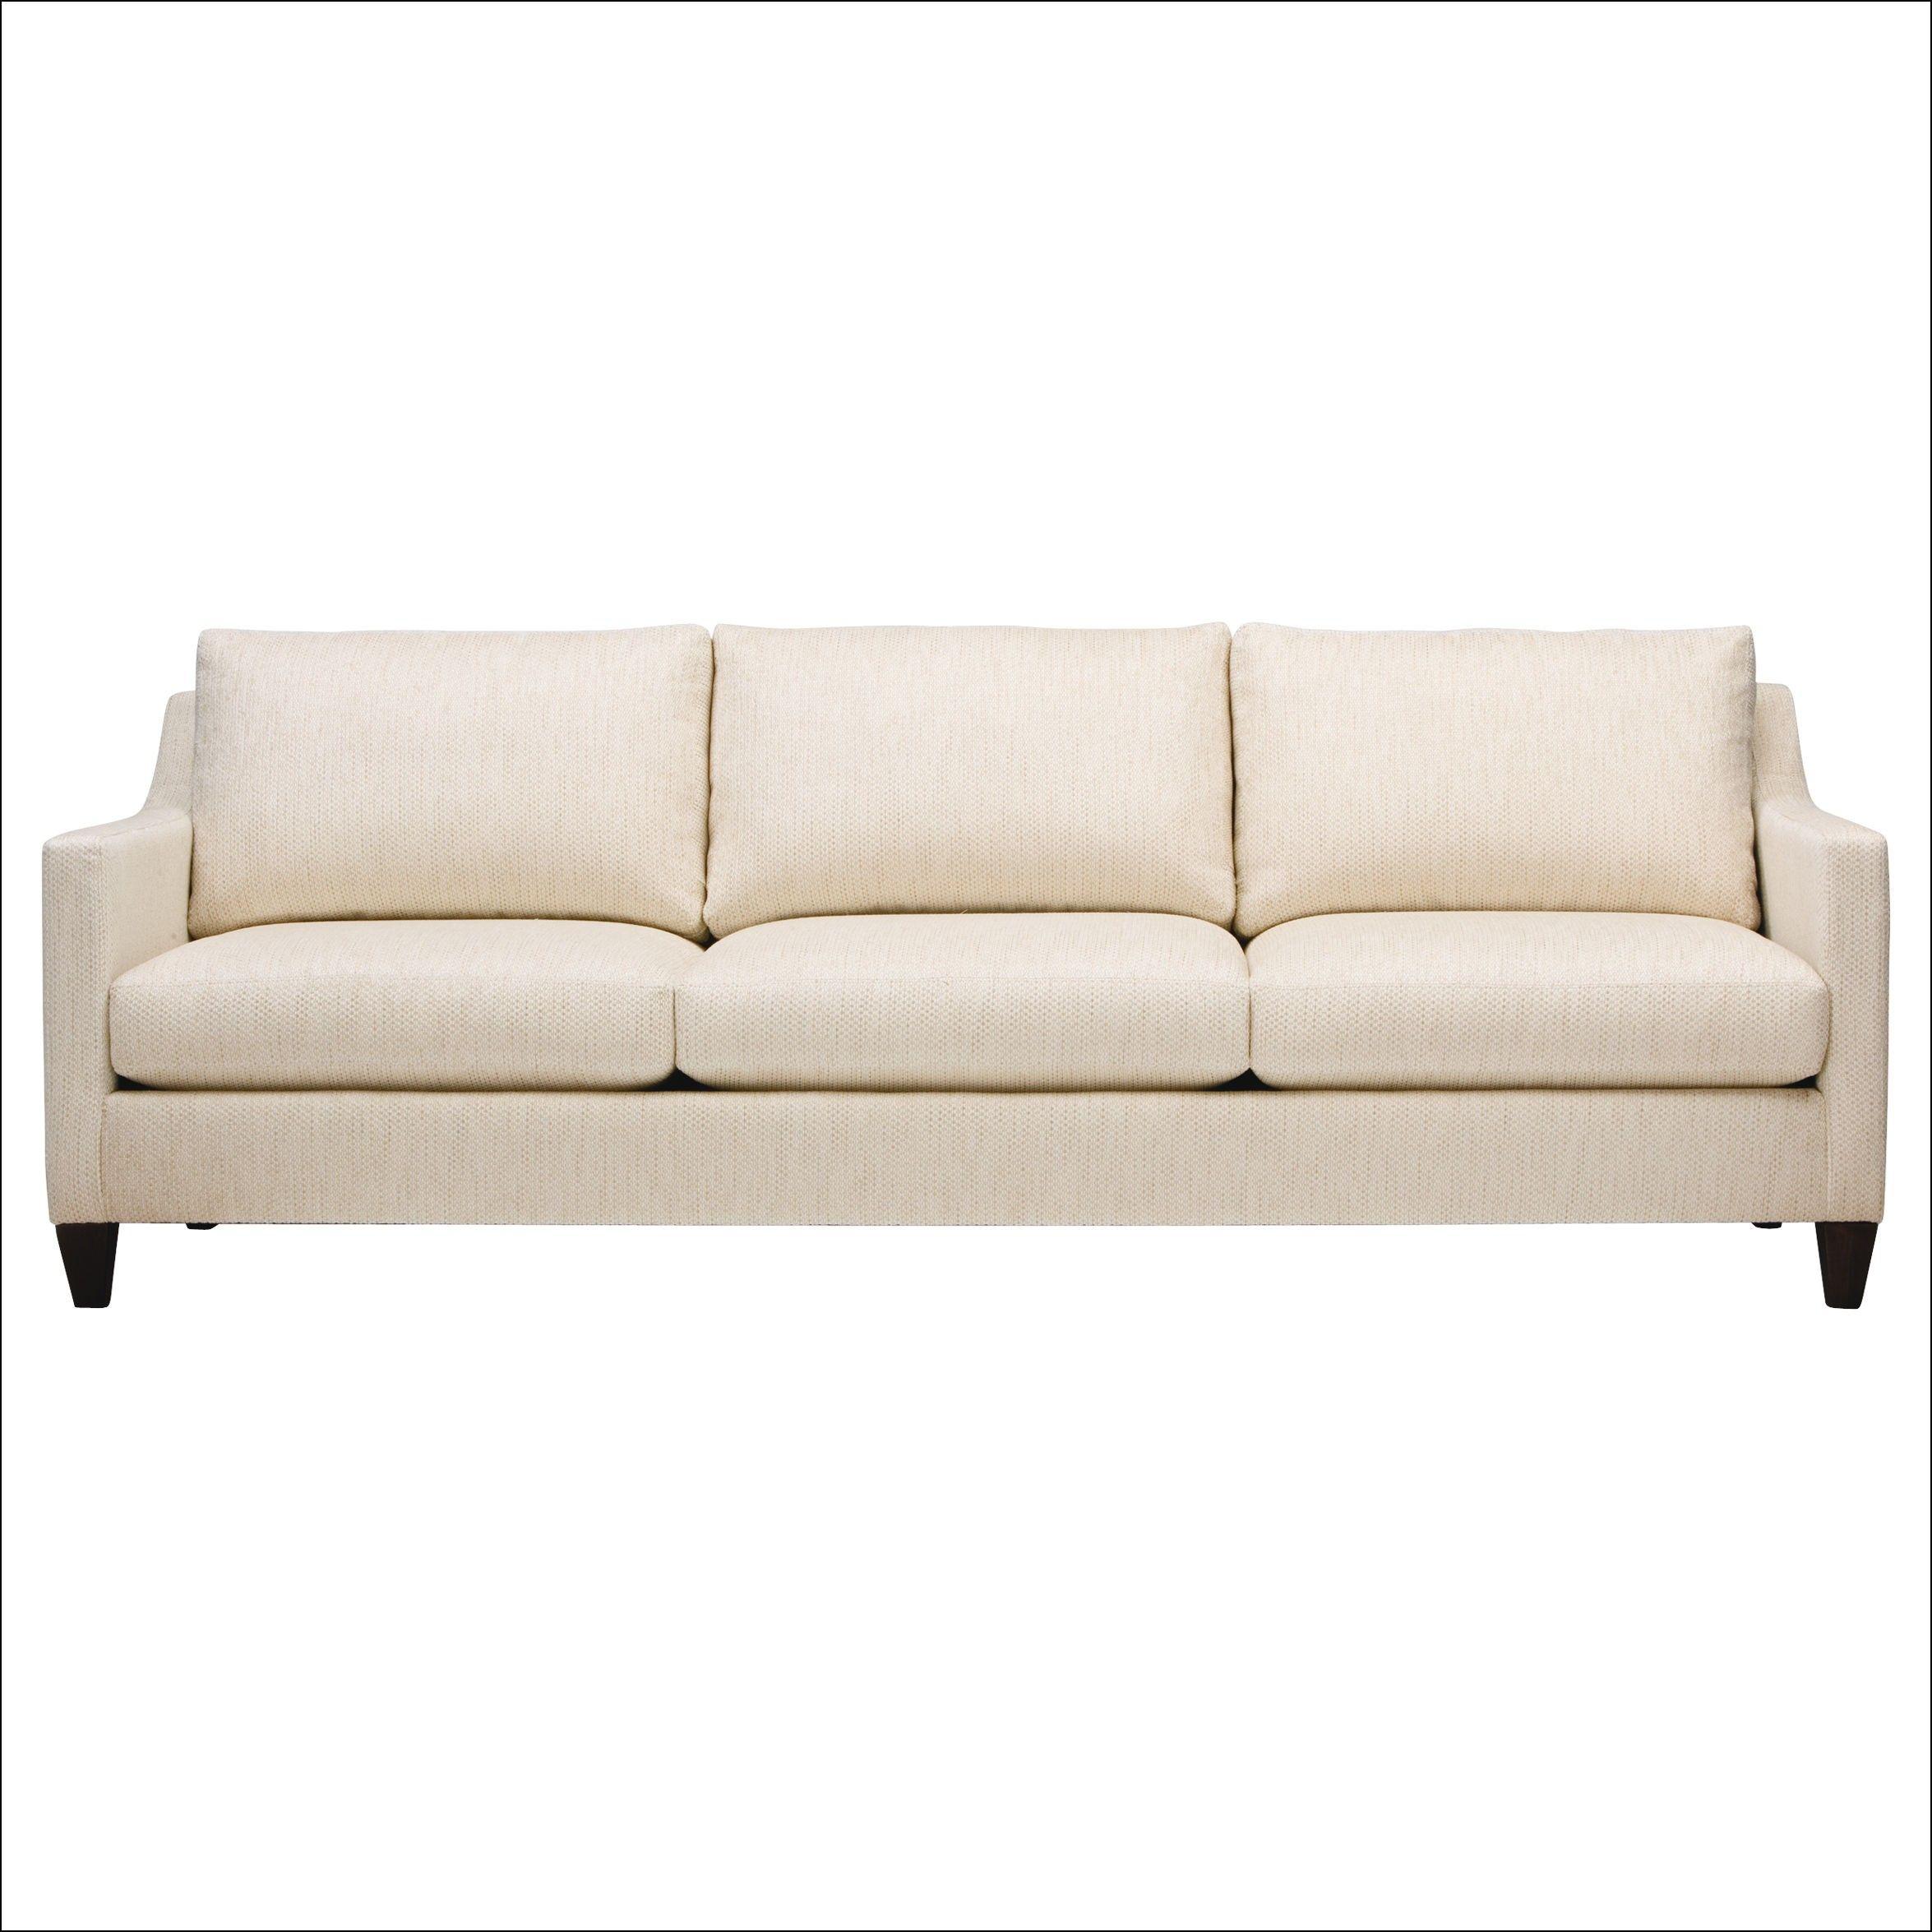 46 Deep Sofa Dekor Ve Mobilya